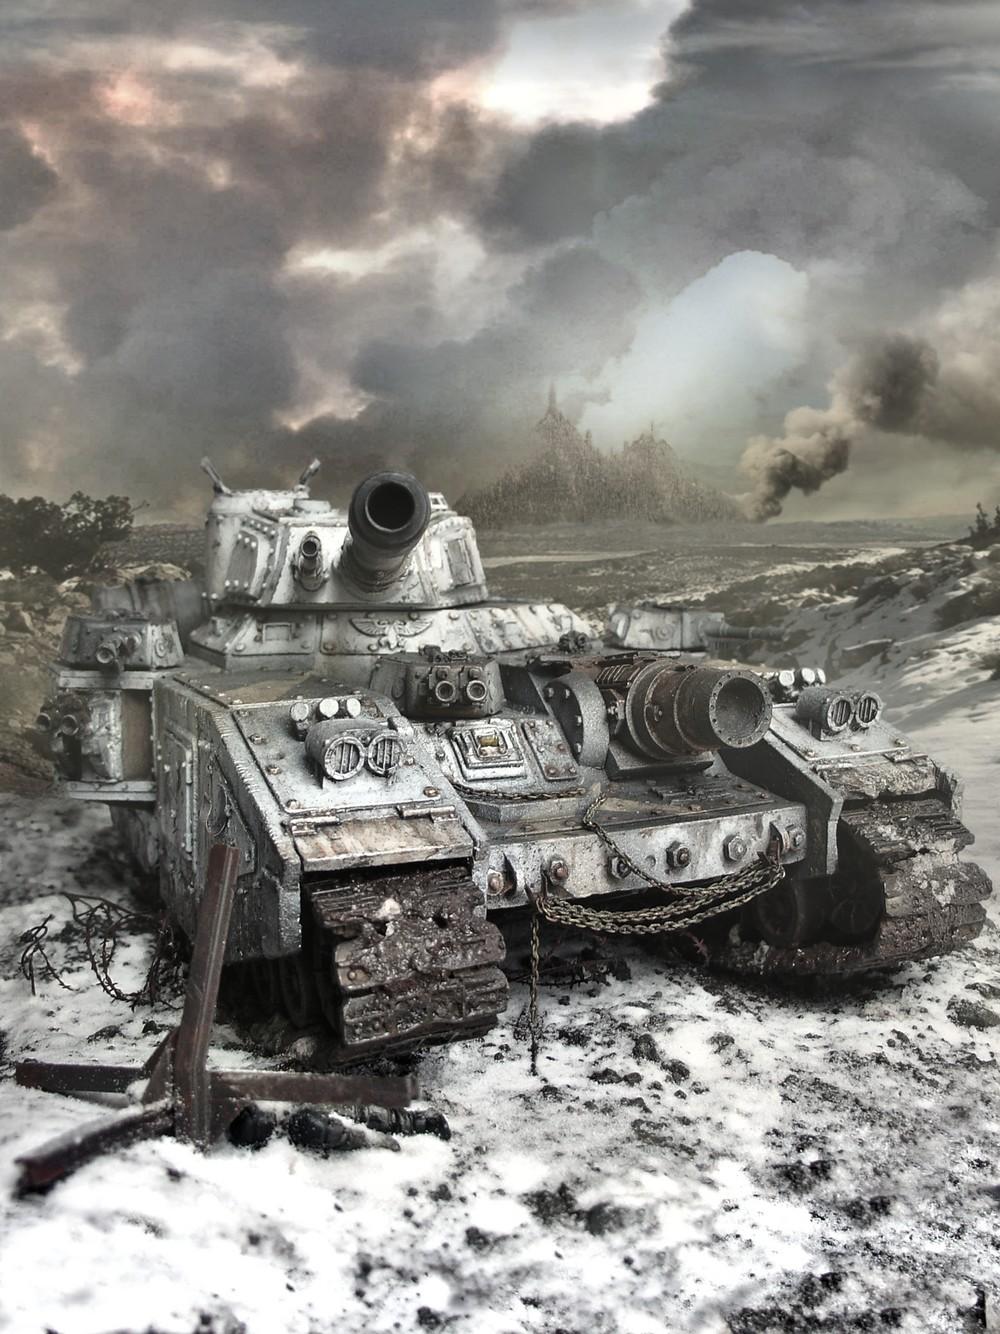 [W40K] Collection d'images : Warhammer 40K divers et inclassables 982684Arkurion6